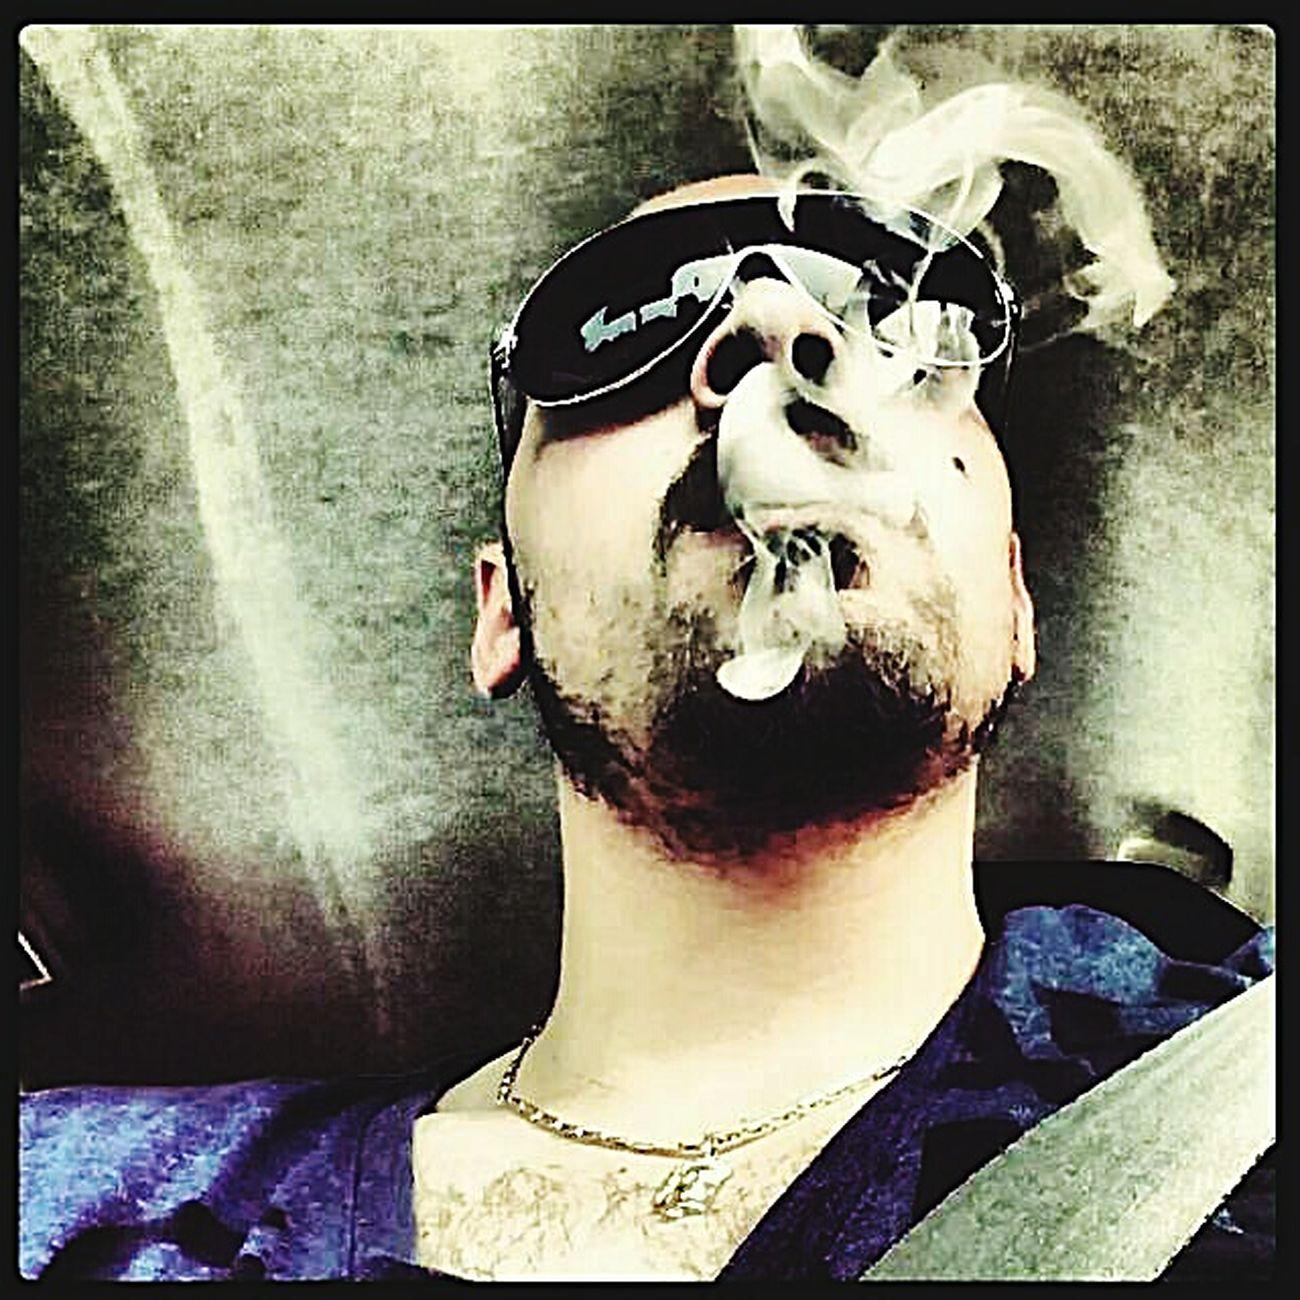 Smoke Selfie Tagsforlikes Mannheim Ludwigshafen Germany Italyman Sunglasses